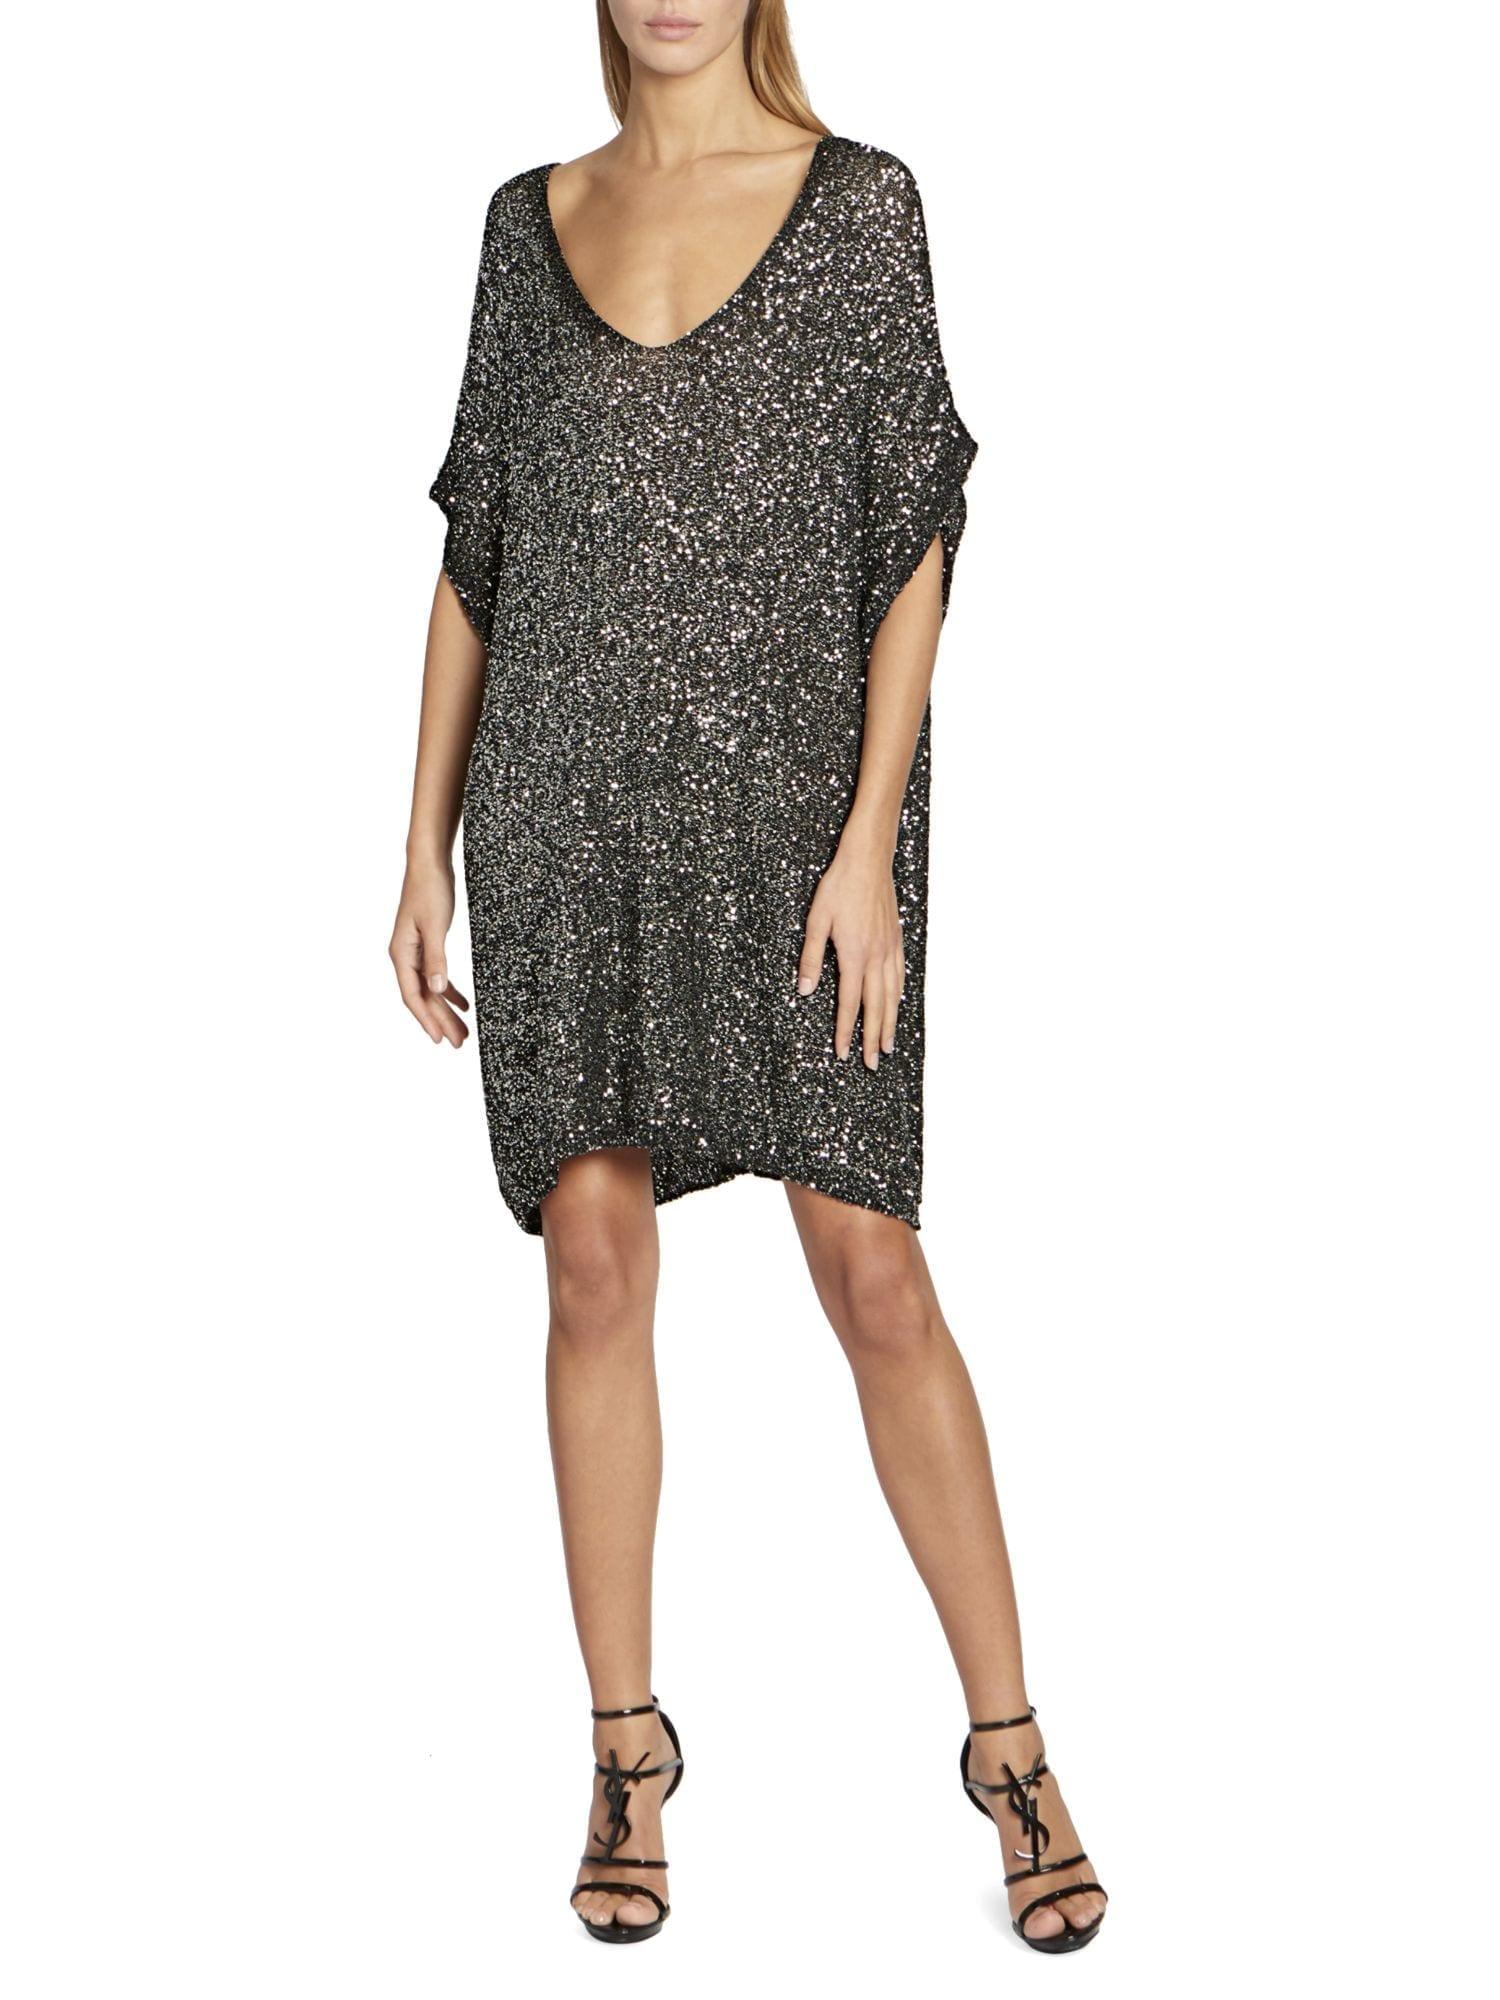 SAINT LAURENT Sequin Caftan Dress